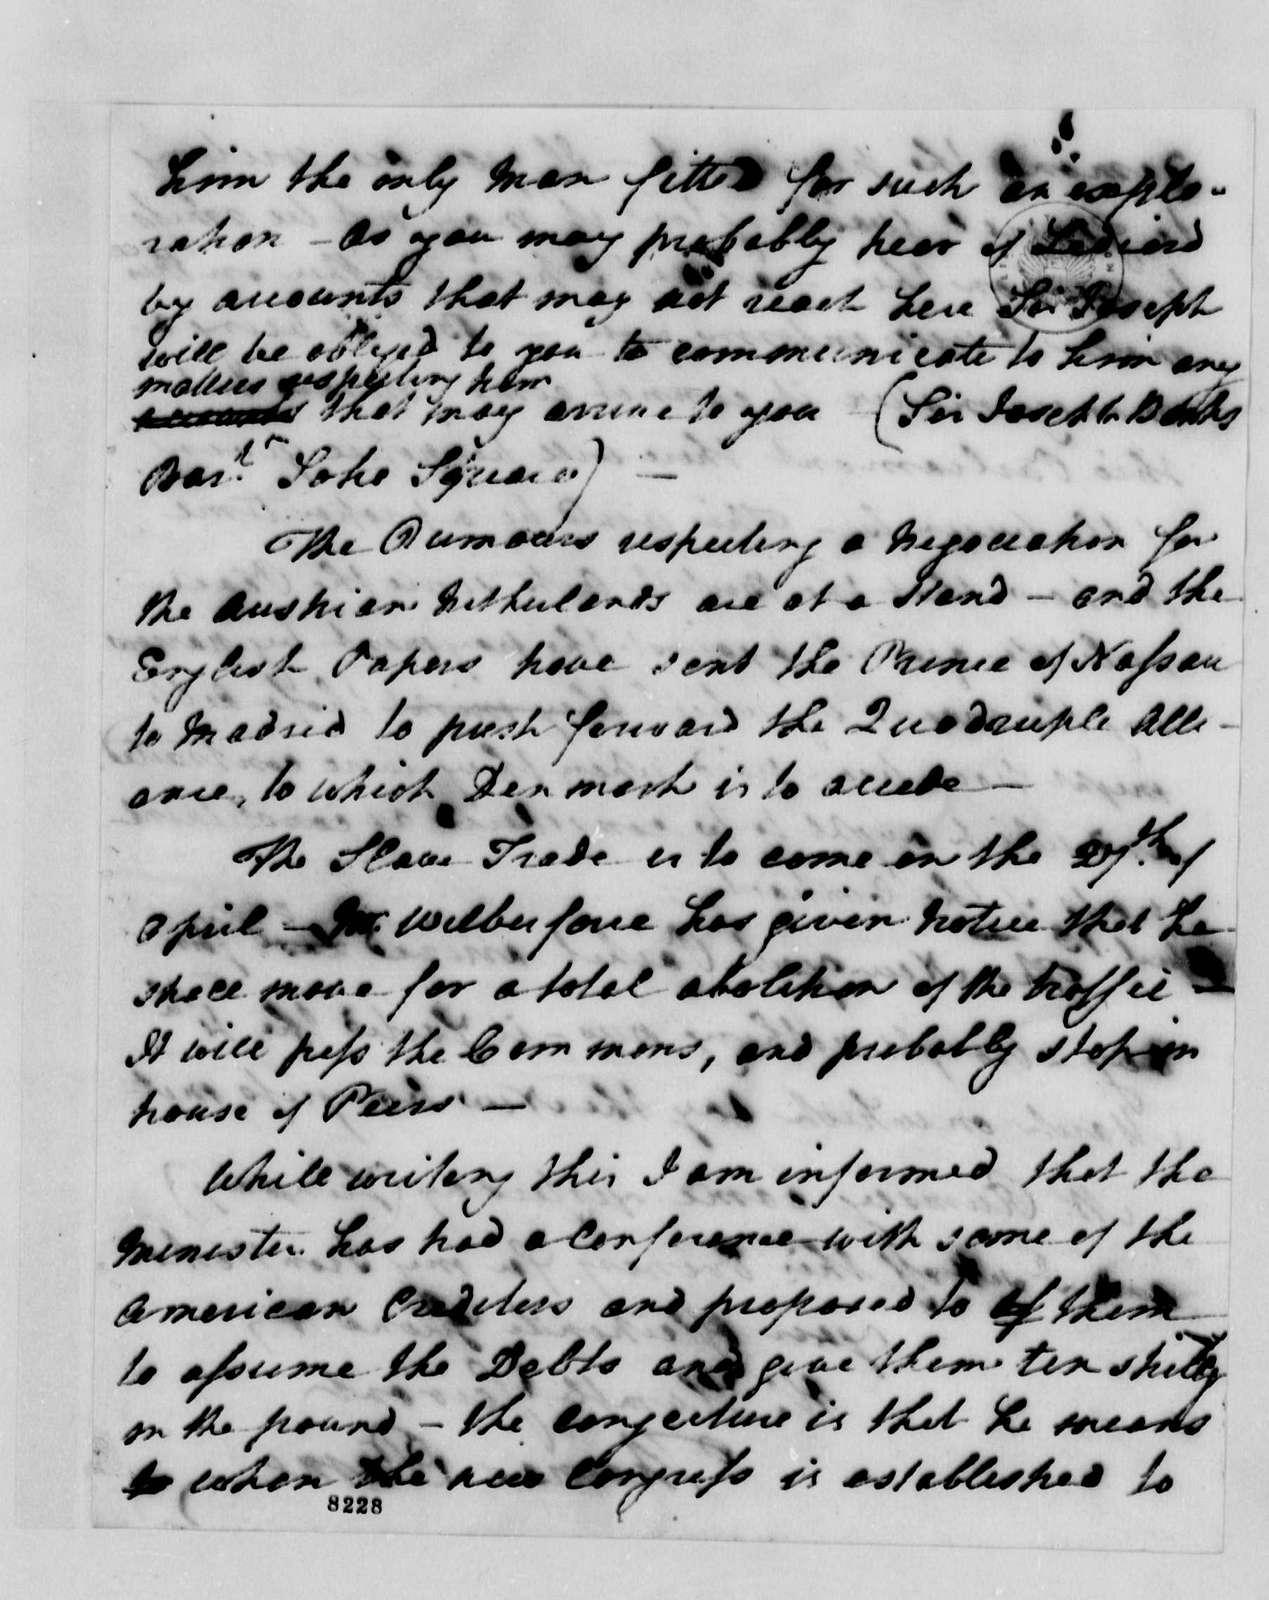 Thomas Paine to Thomas Jefferson, April 10, 1789